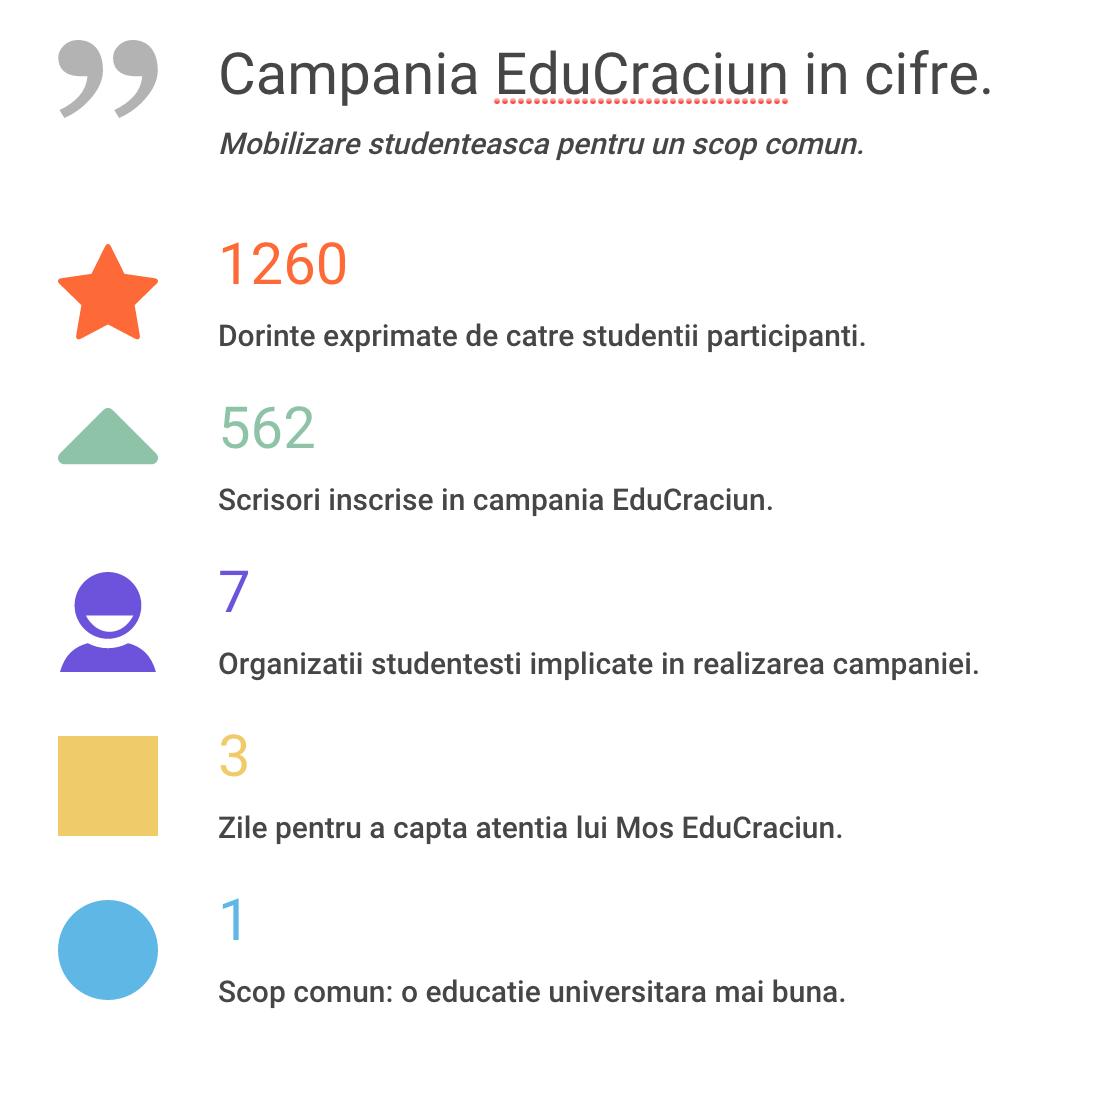 EduCraciun in cifre